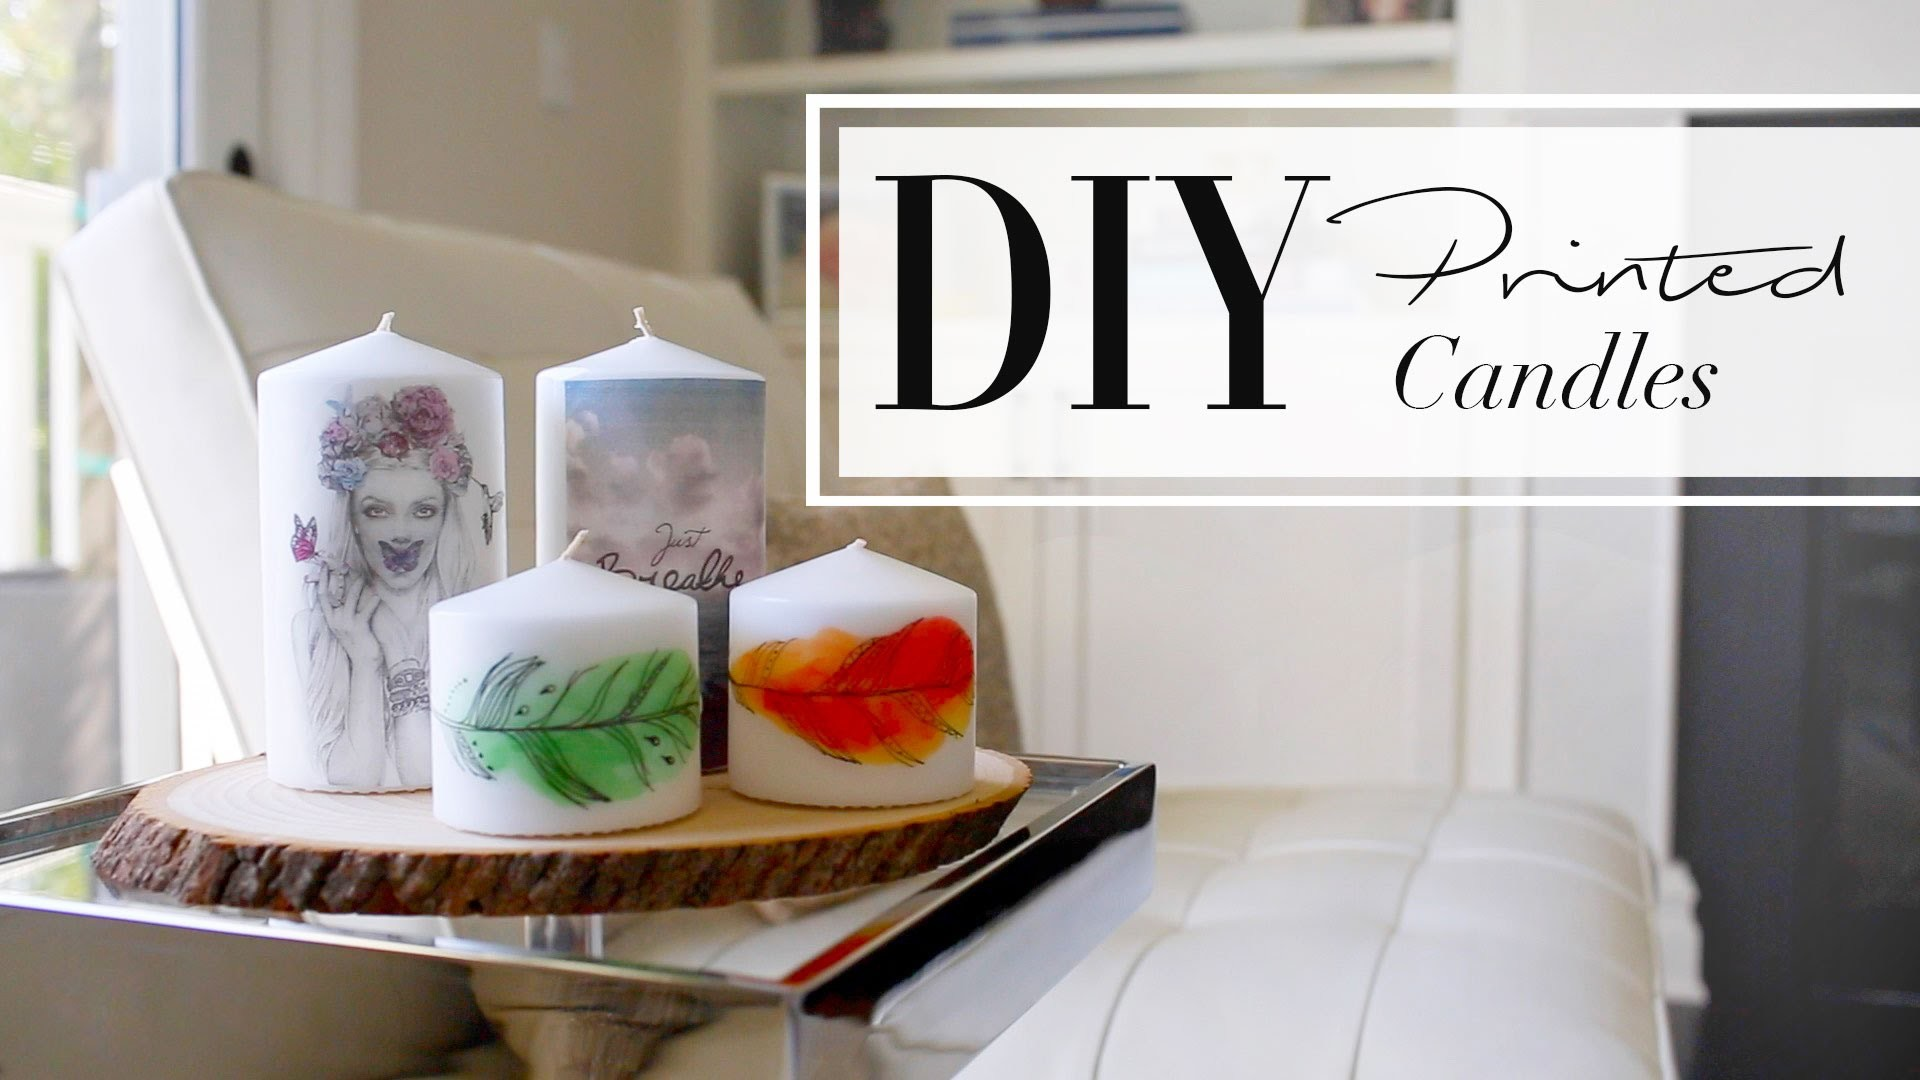 DIY Printed Candles | ANNEORSHINE & WhatsUpMoms